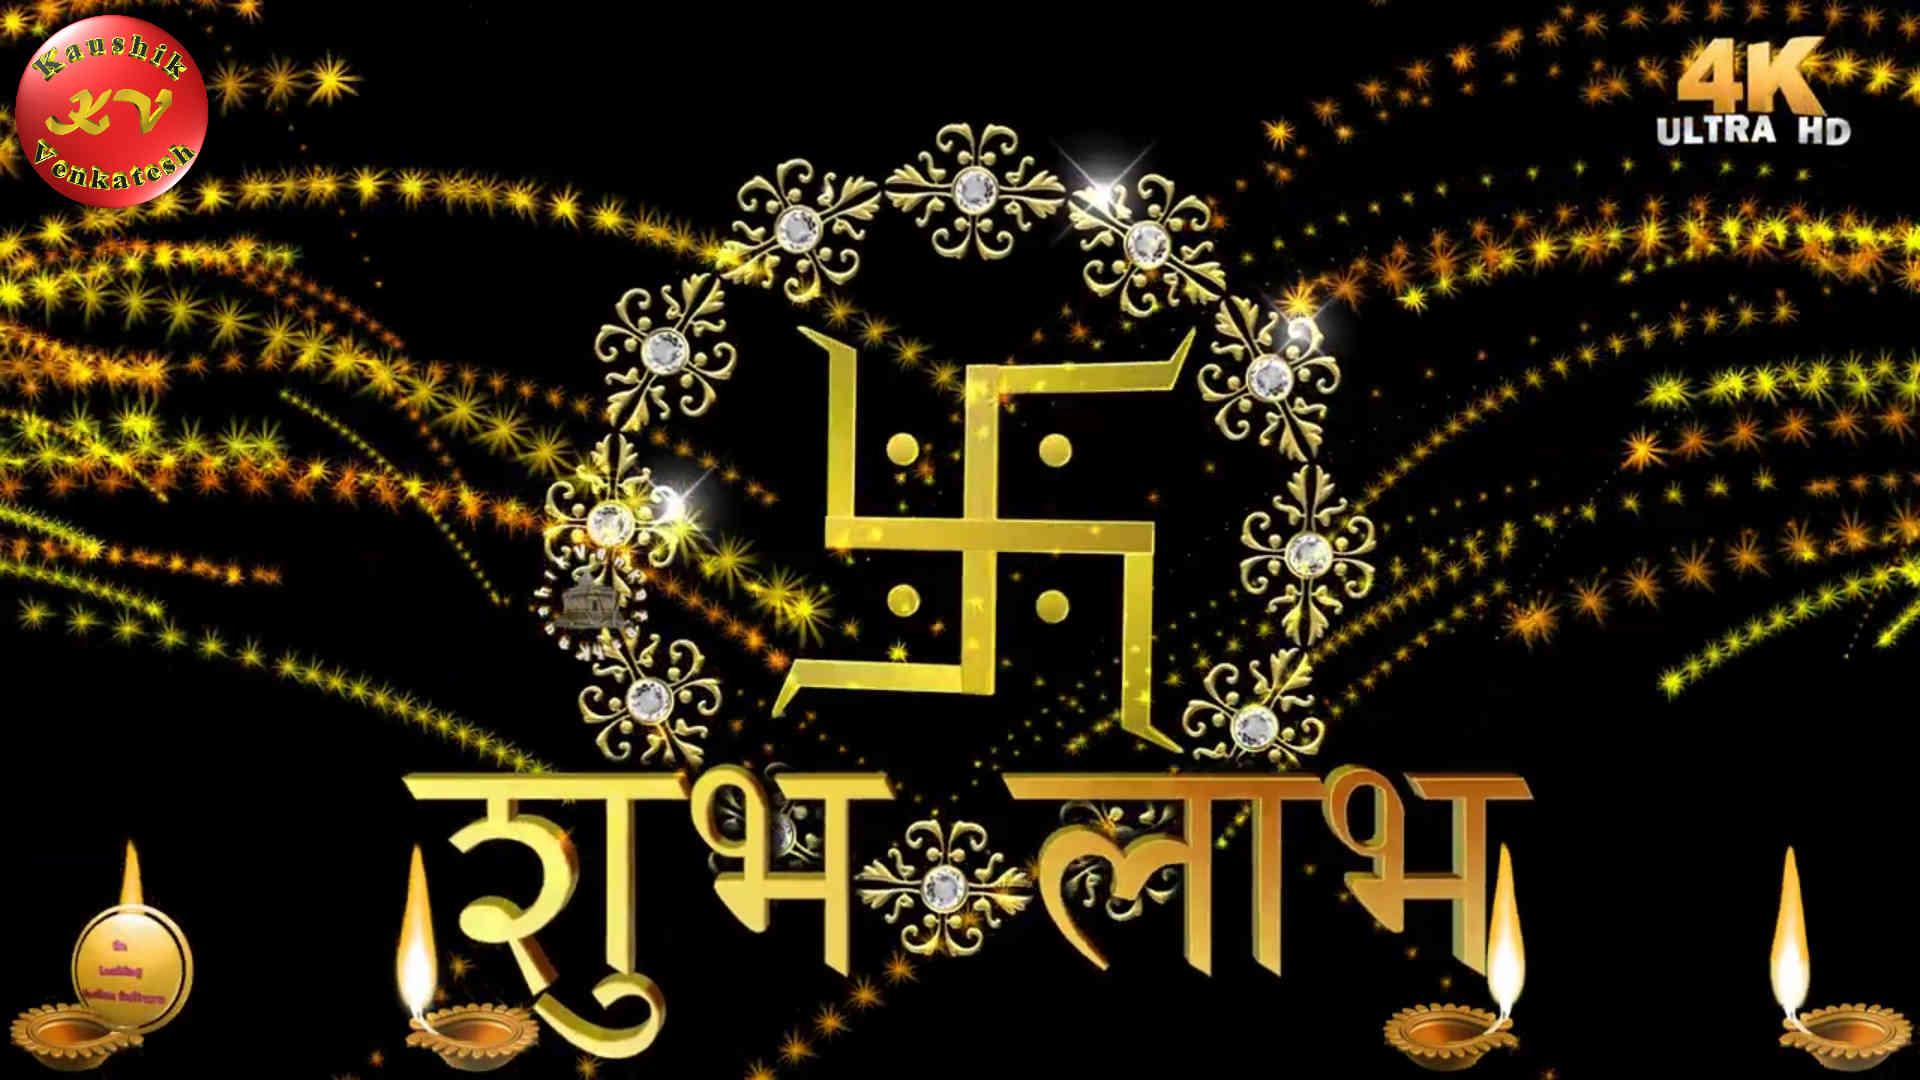 4K Ultra Hd Videos of Deepavali Festival.